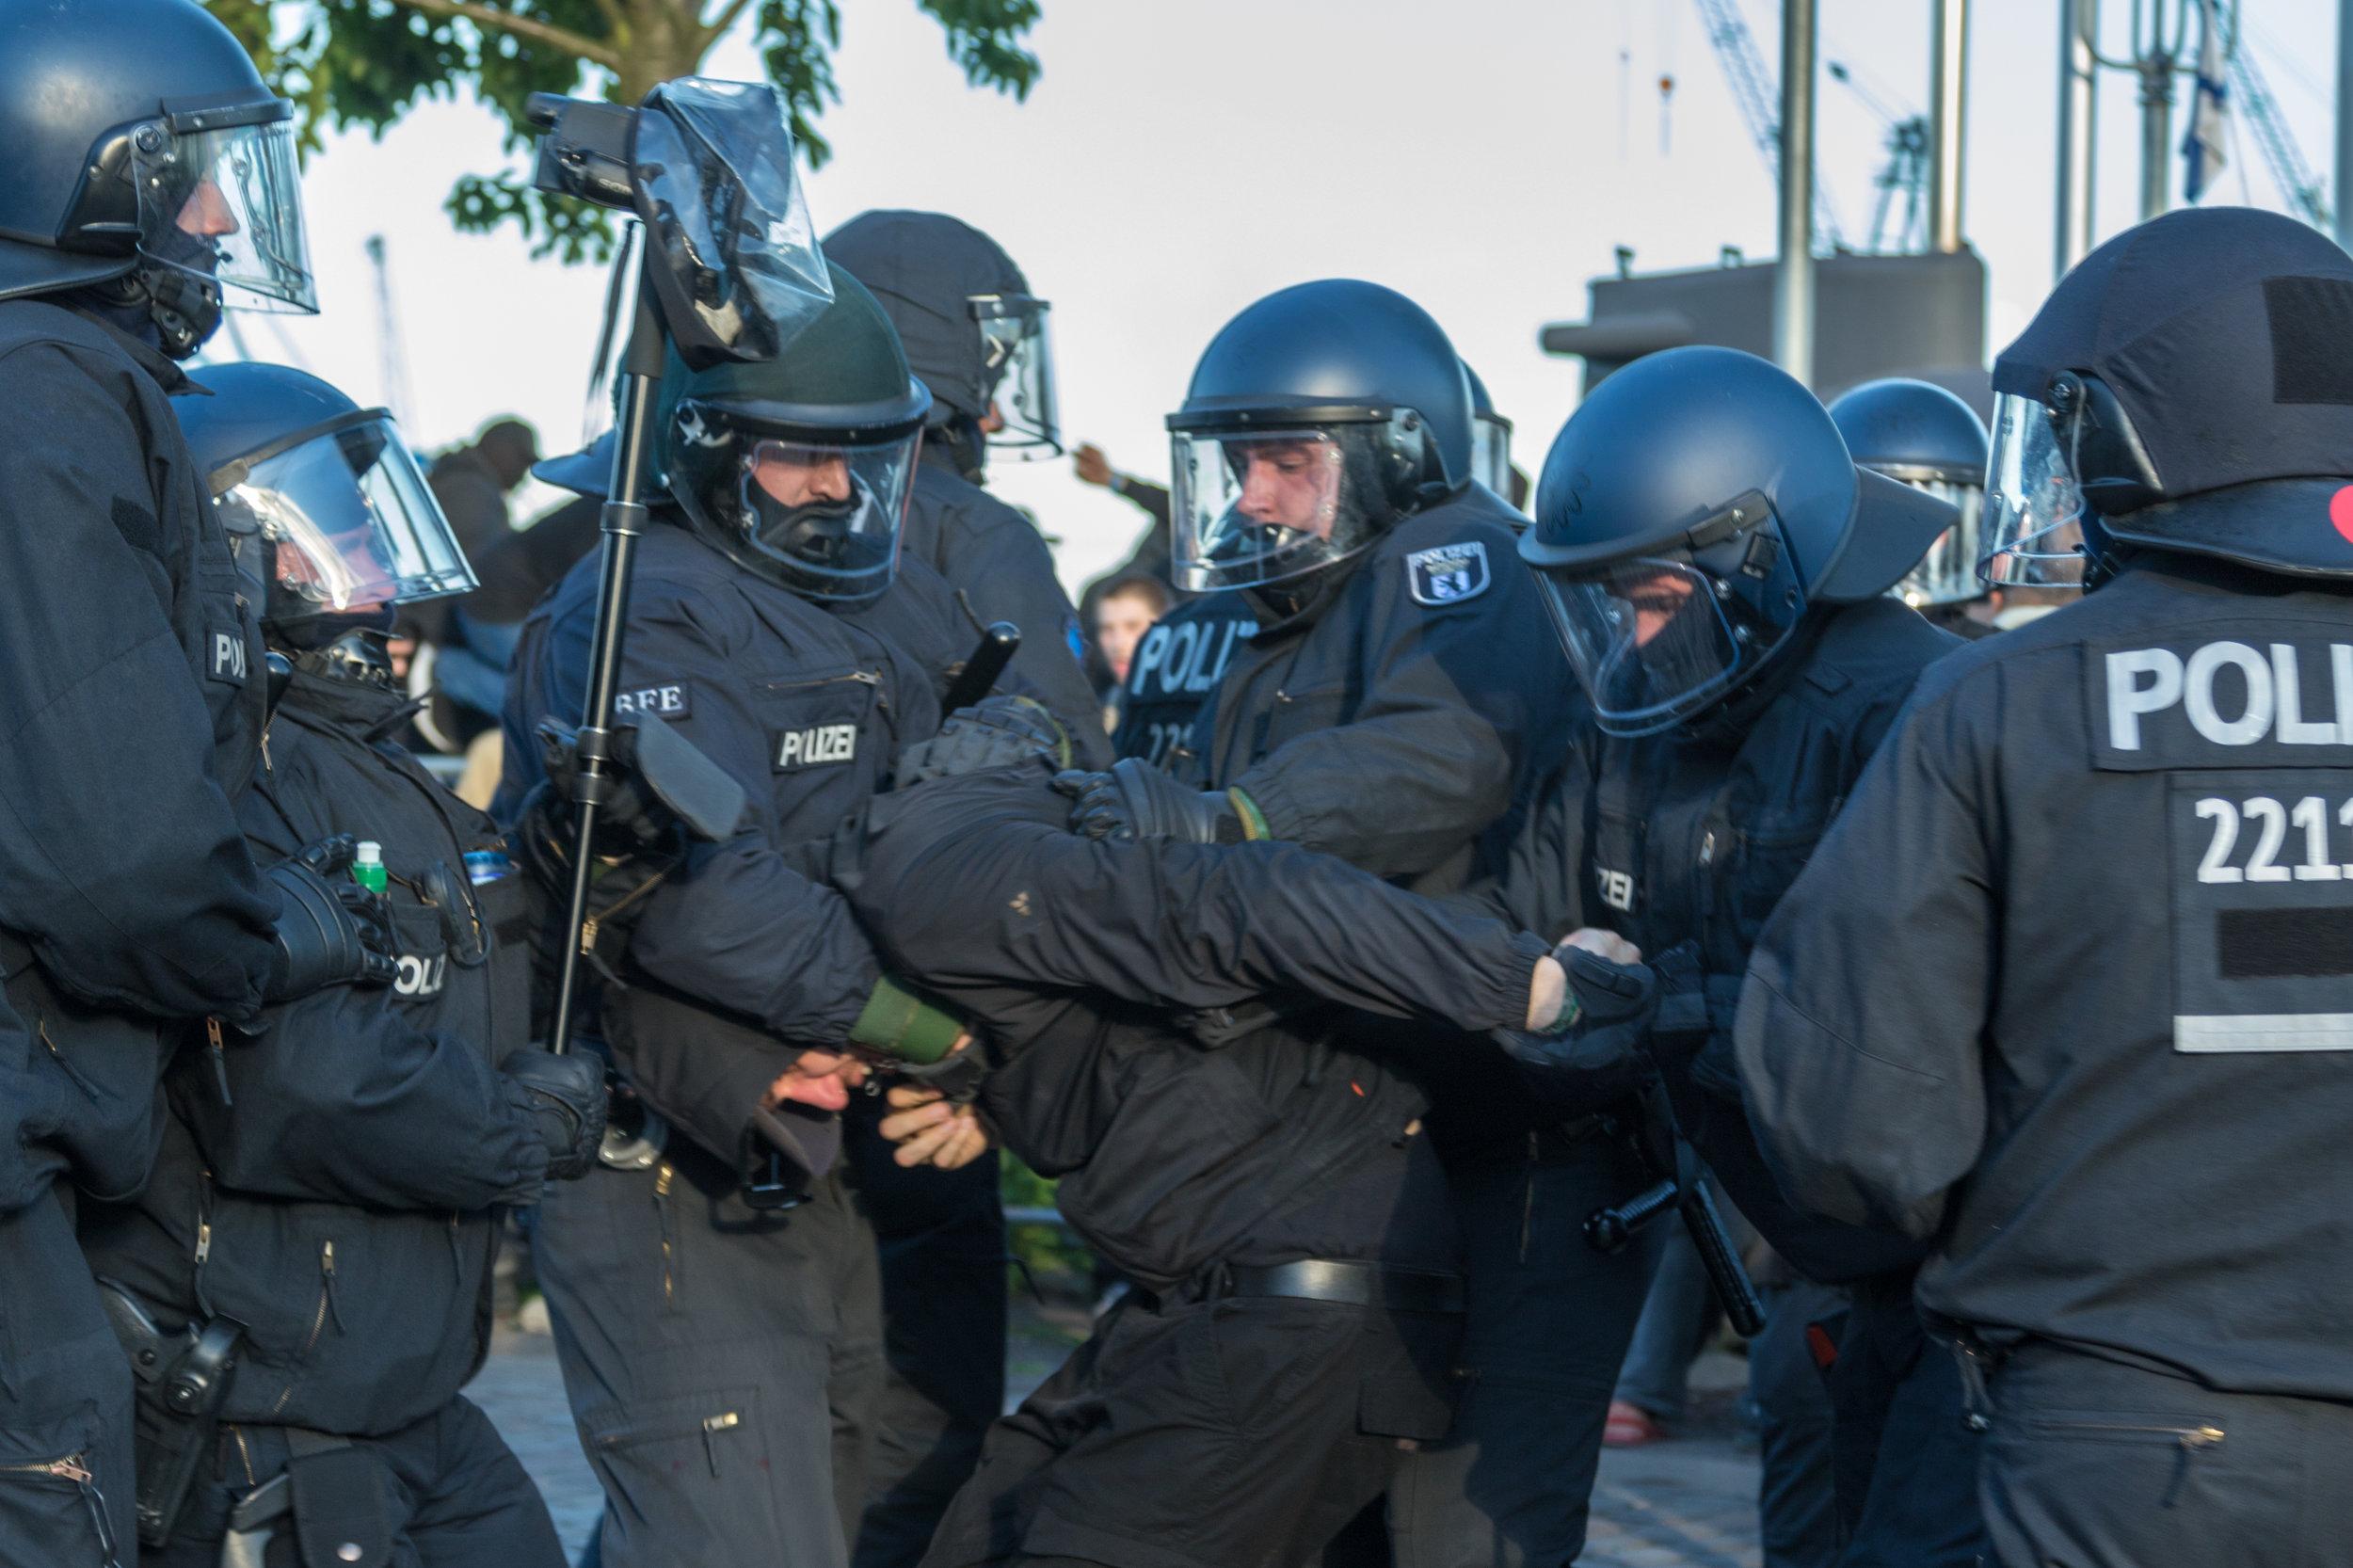 Welcome to Hell Polizei nimmt Demonstranten fest.jpg